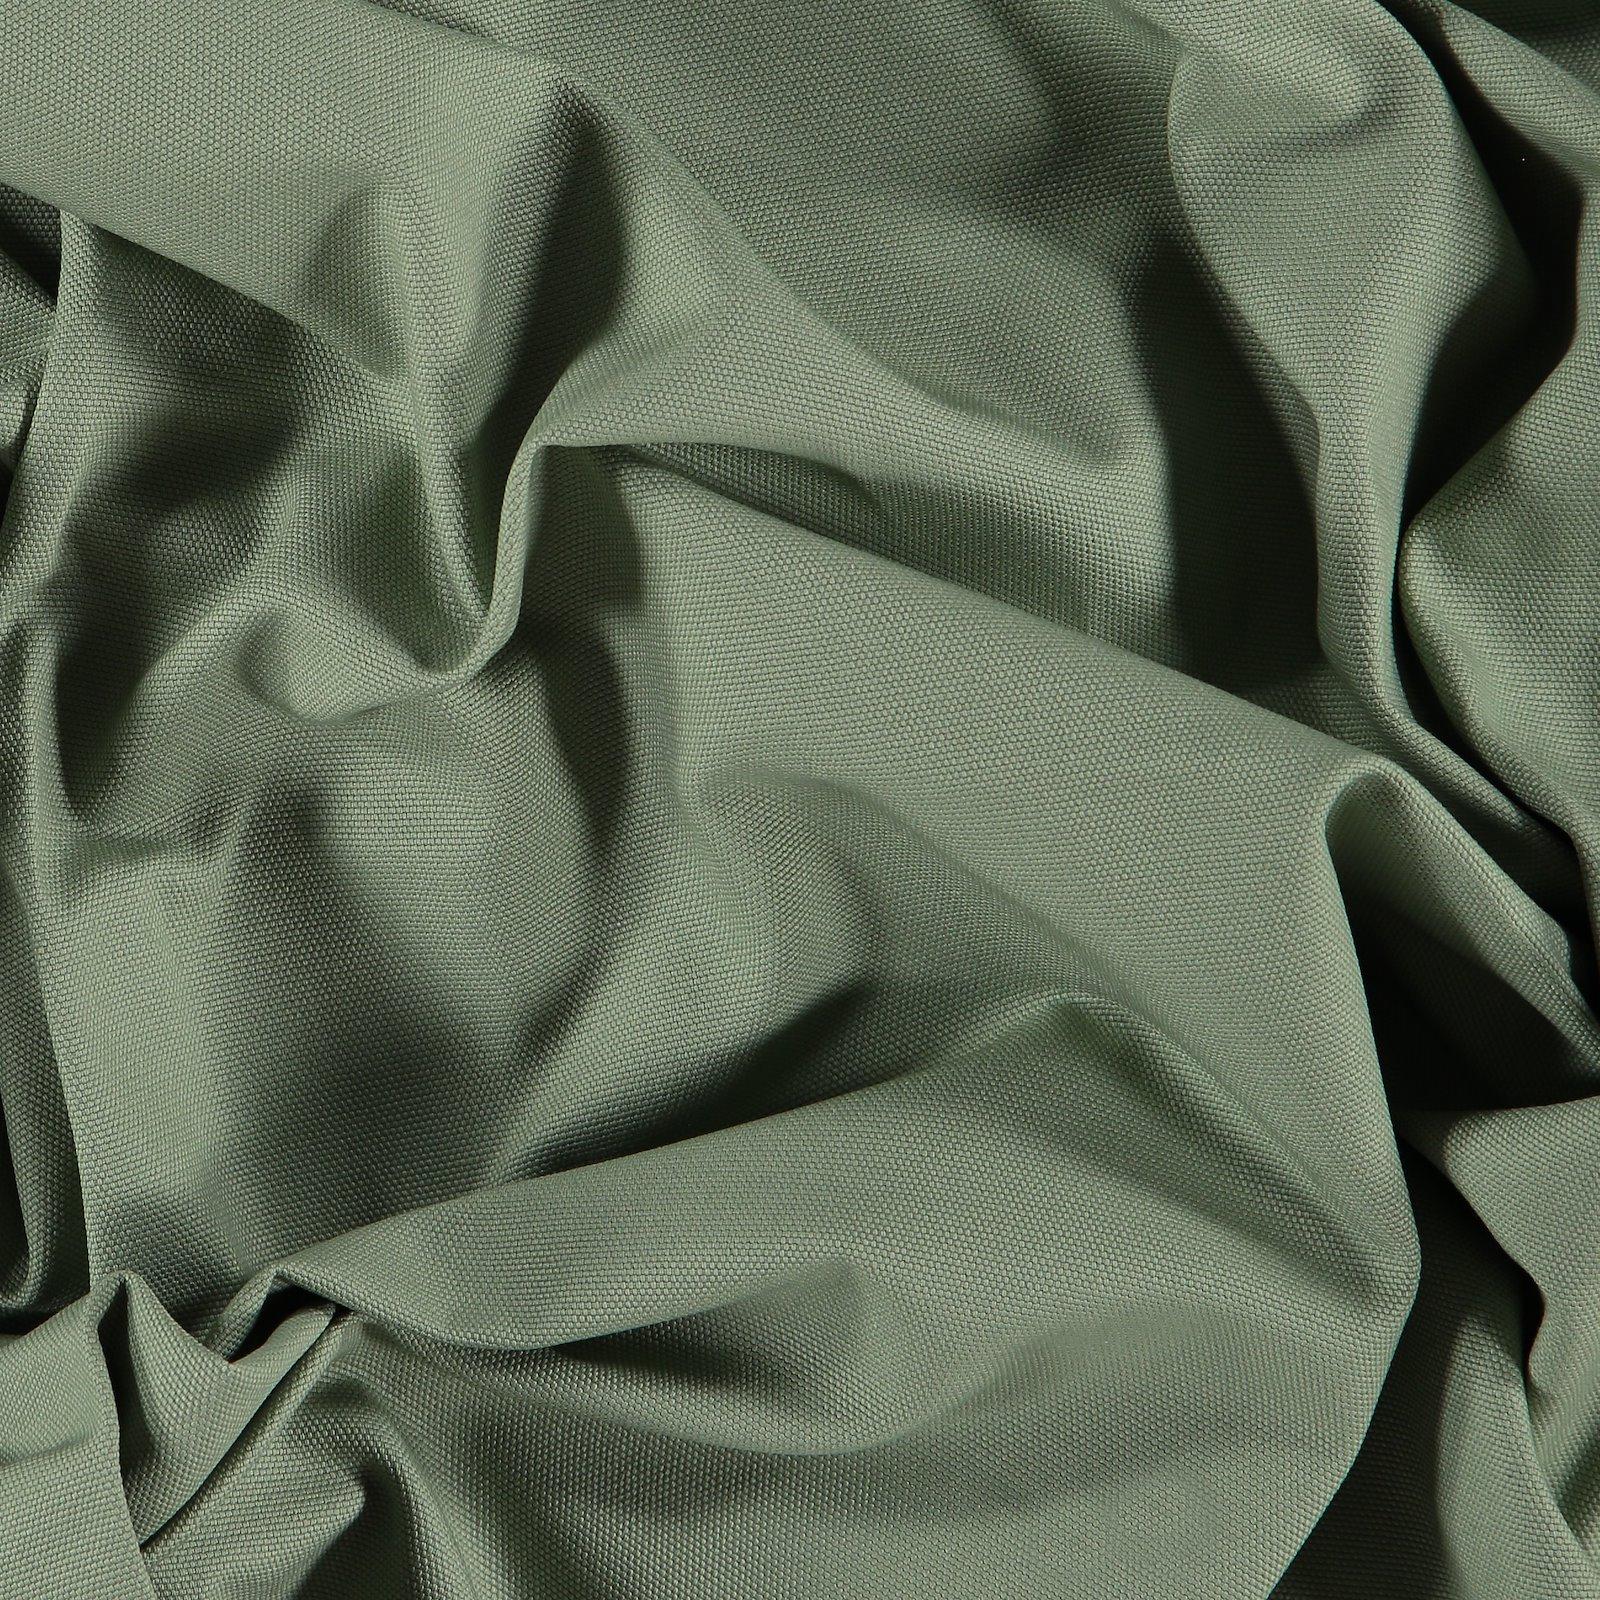 Cotton canvas light dusty green